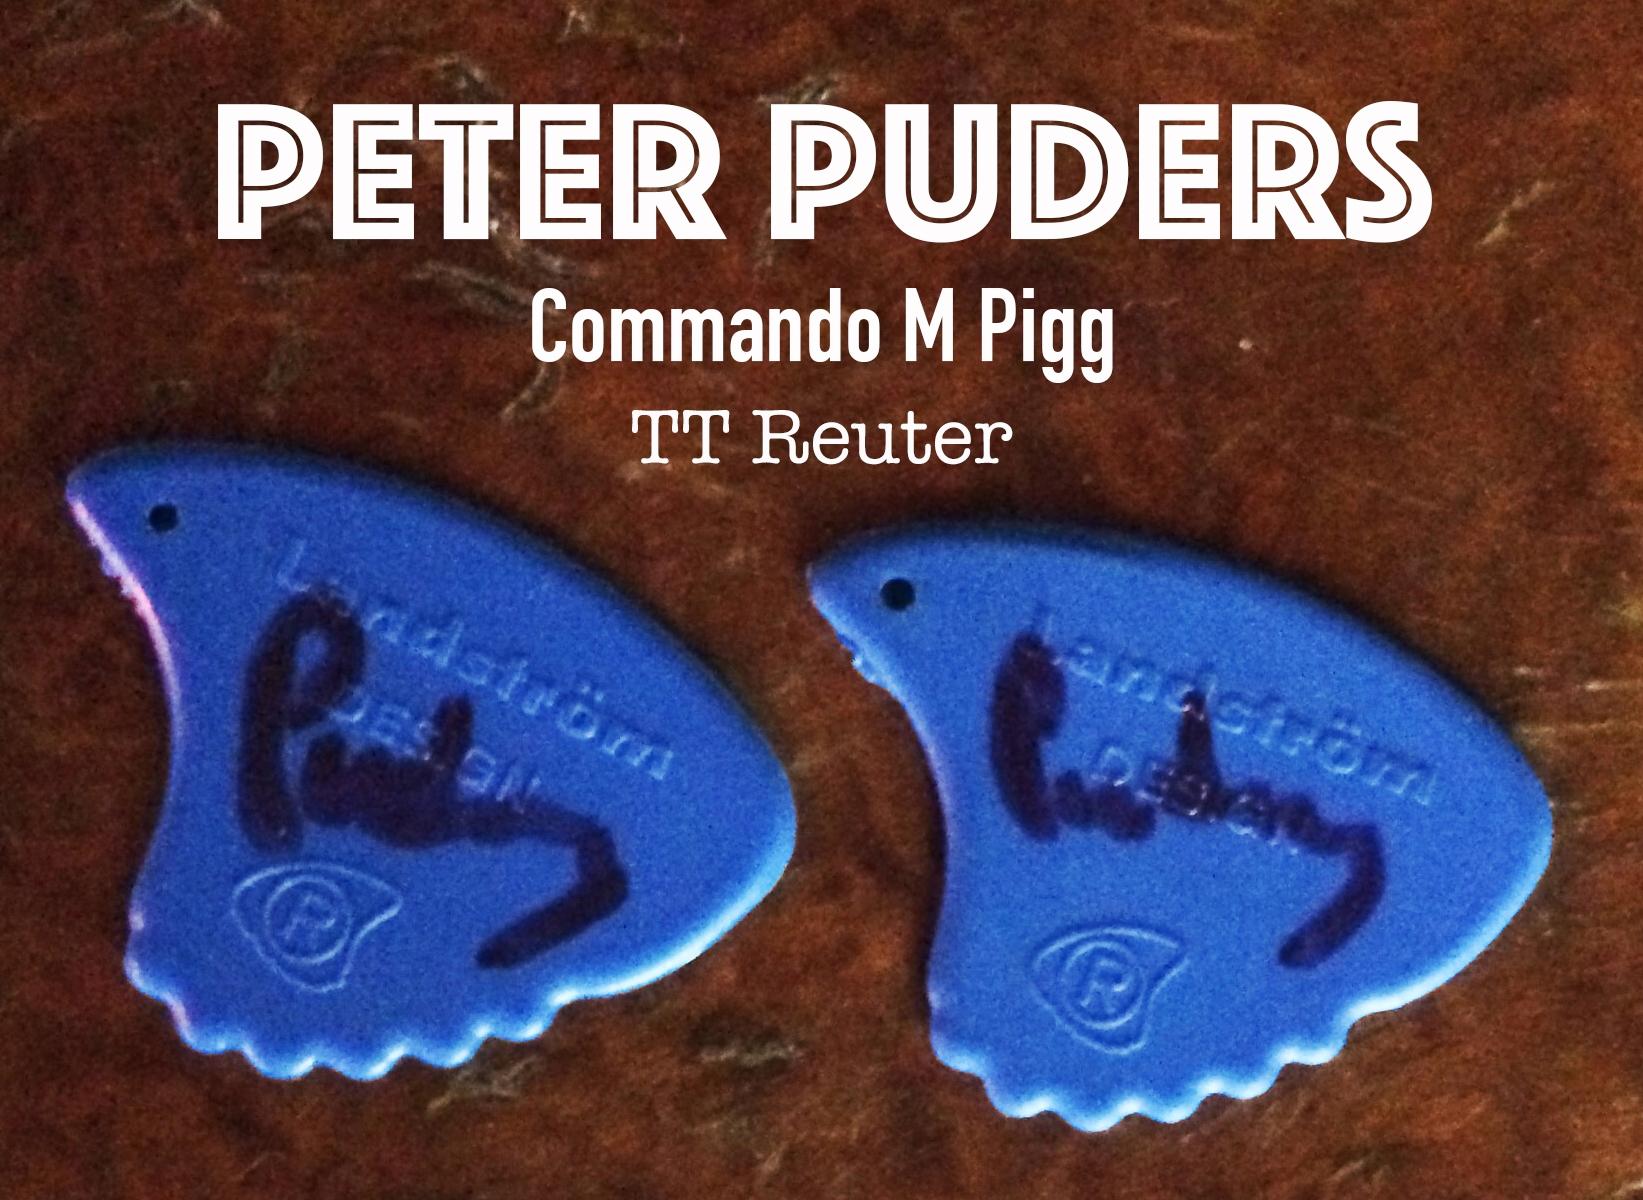 Peter Puders